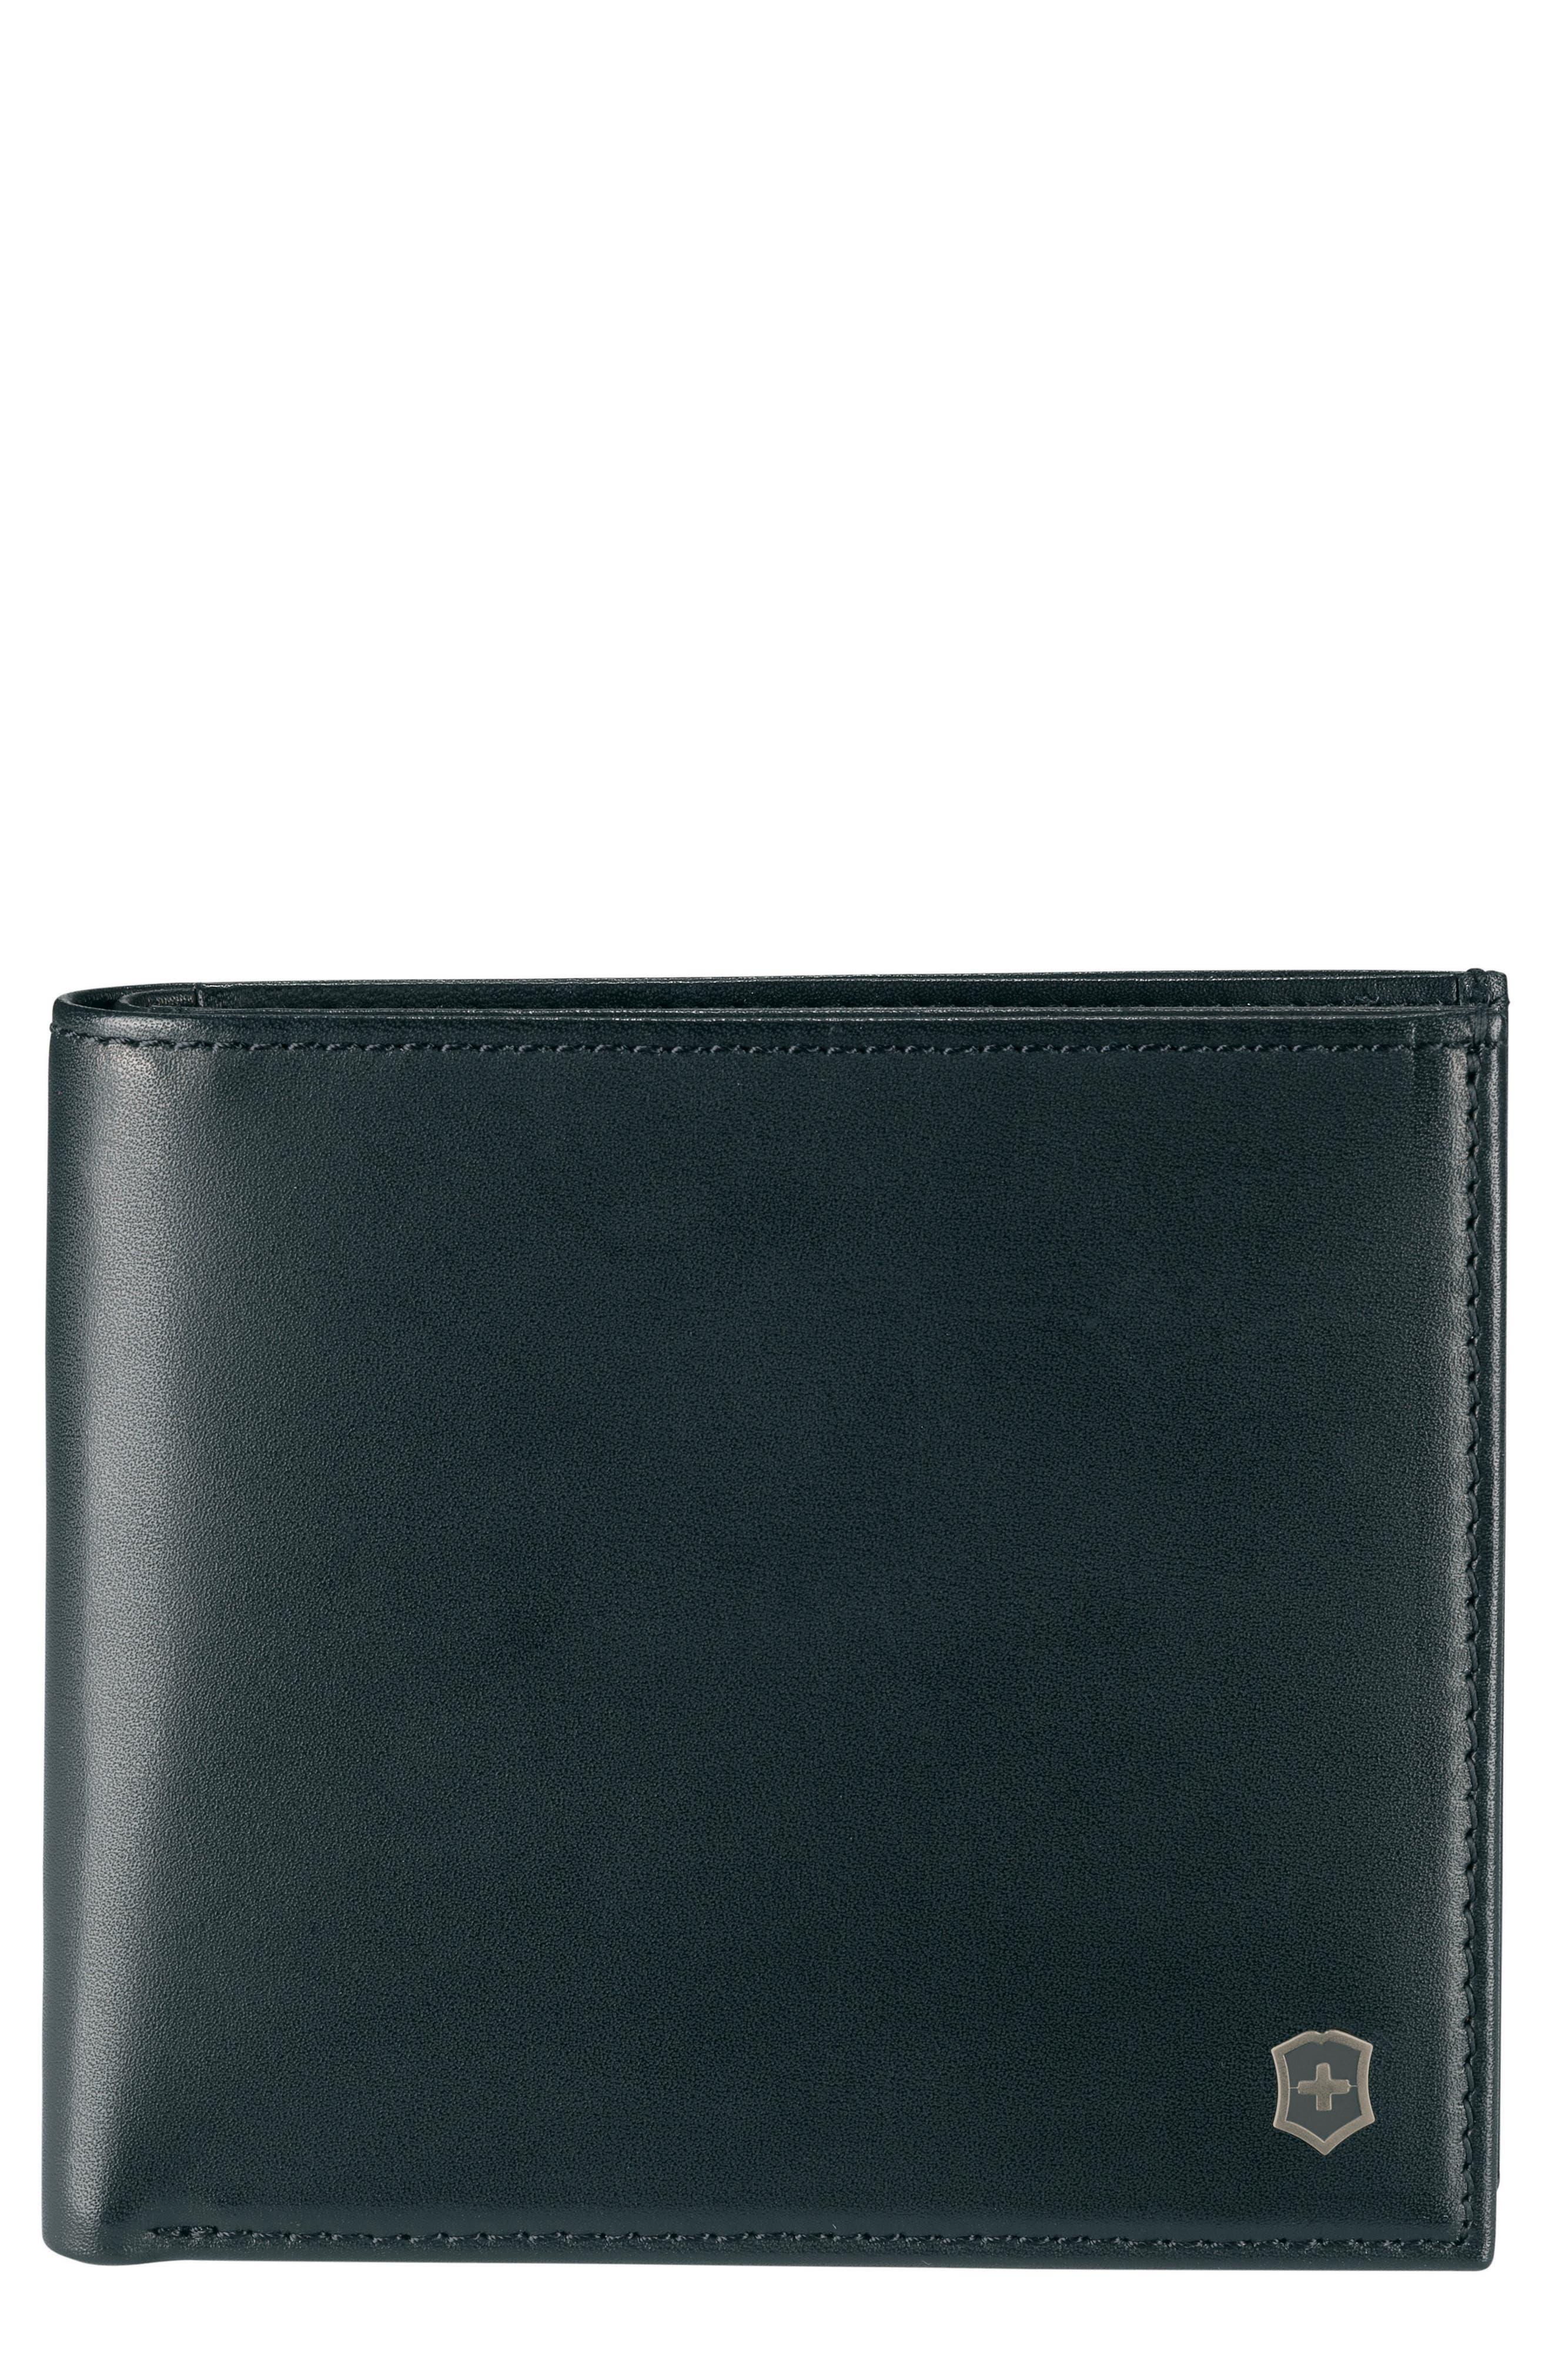 VICTORINOX SWISS ARMY<SUP>®</SUP> Altius Edge Pythagoras Wallet, Main, color, BLACK